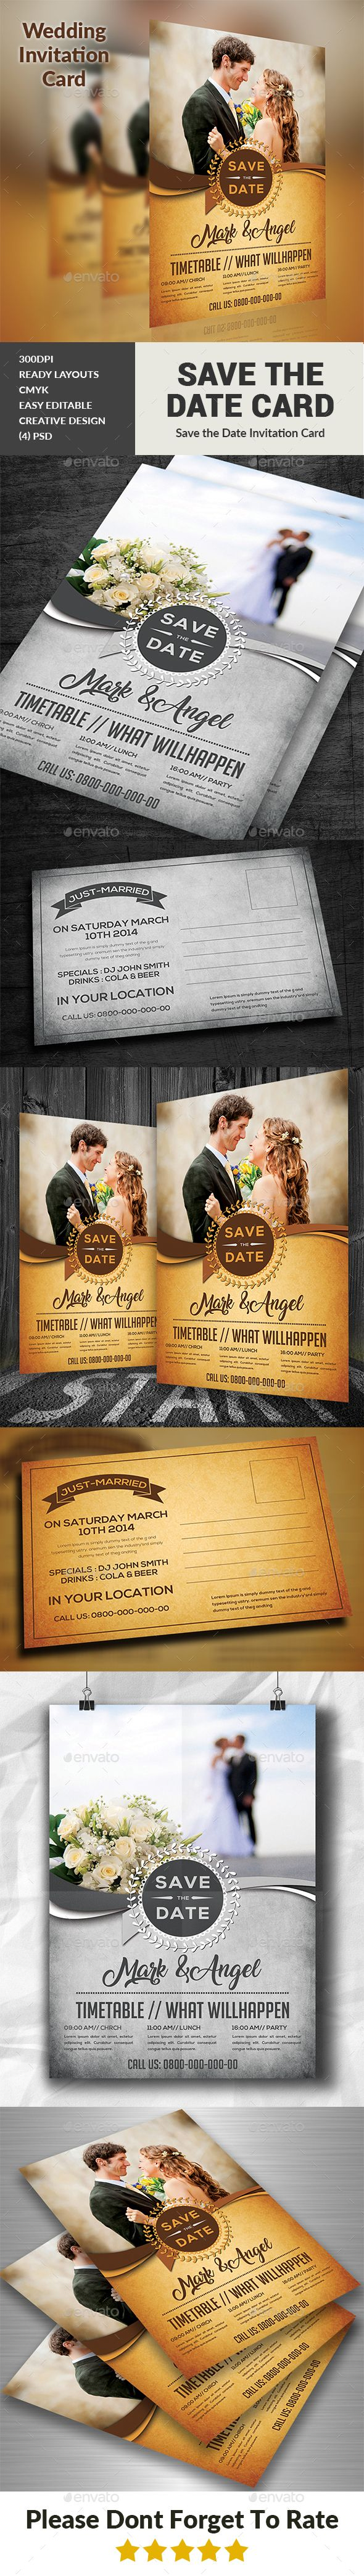 Wedding Invitation 180 best Wedding Invitation Templates